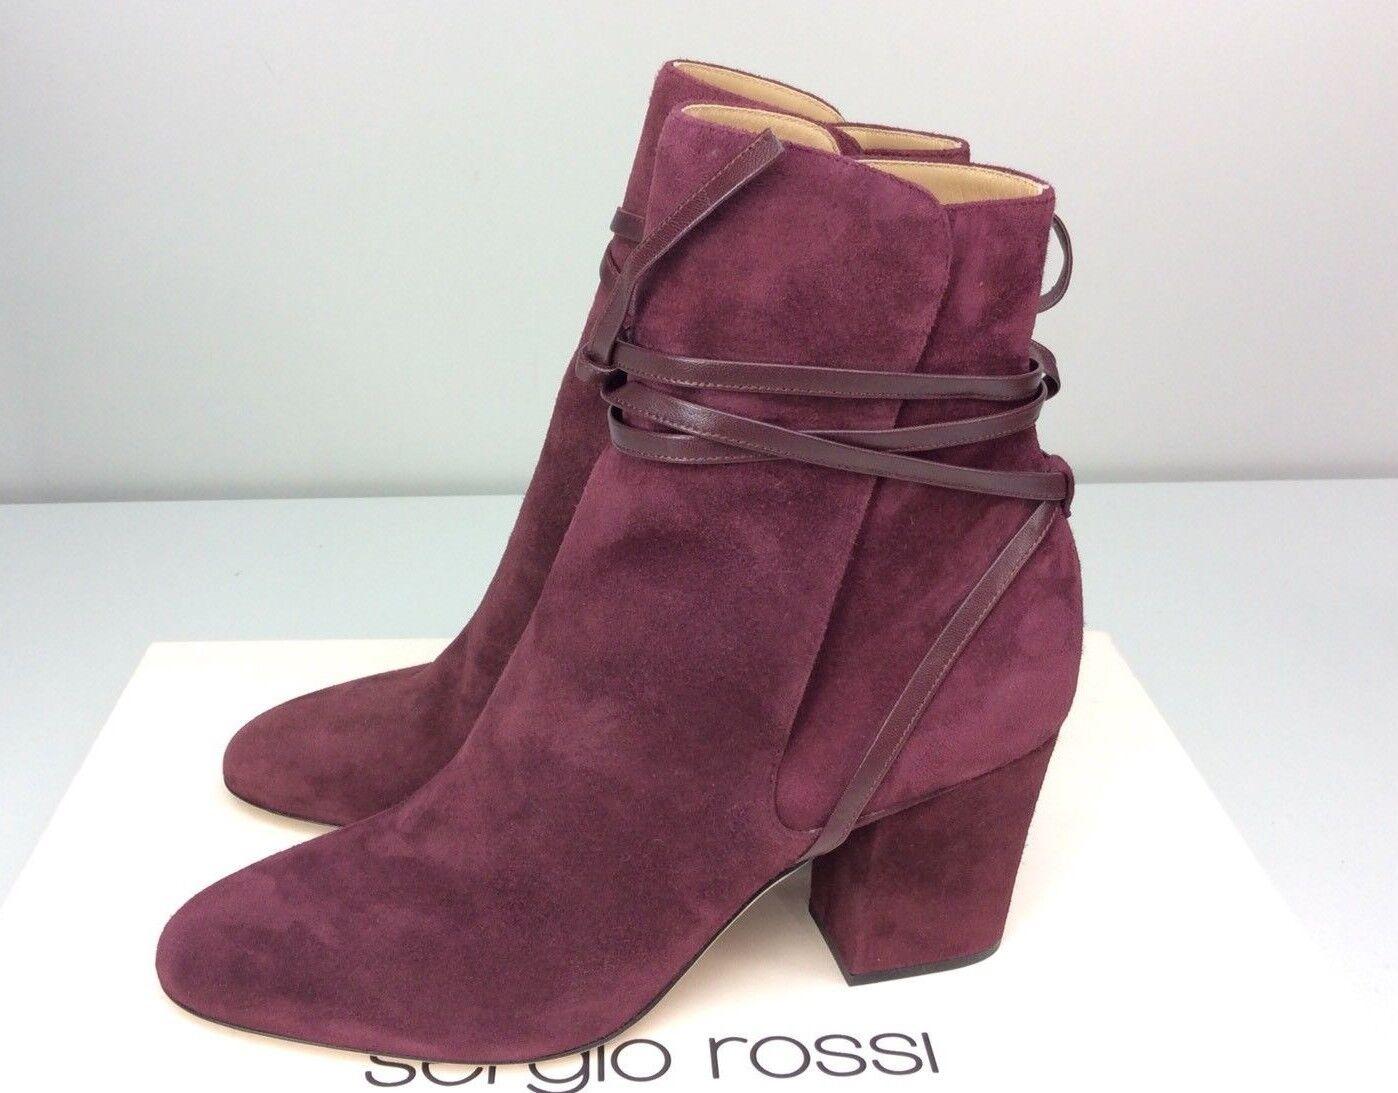 Sergio Rossi Tea Dark Cherry Royal Nappa Nappa Nappa Boots Bootie EU 40 US 10 Chunky Heel 53d4d5